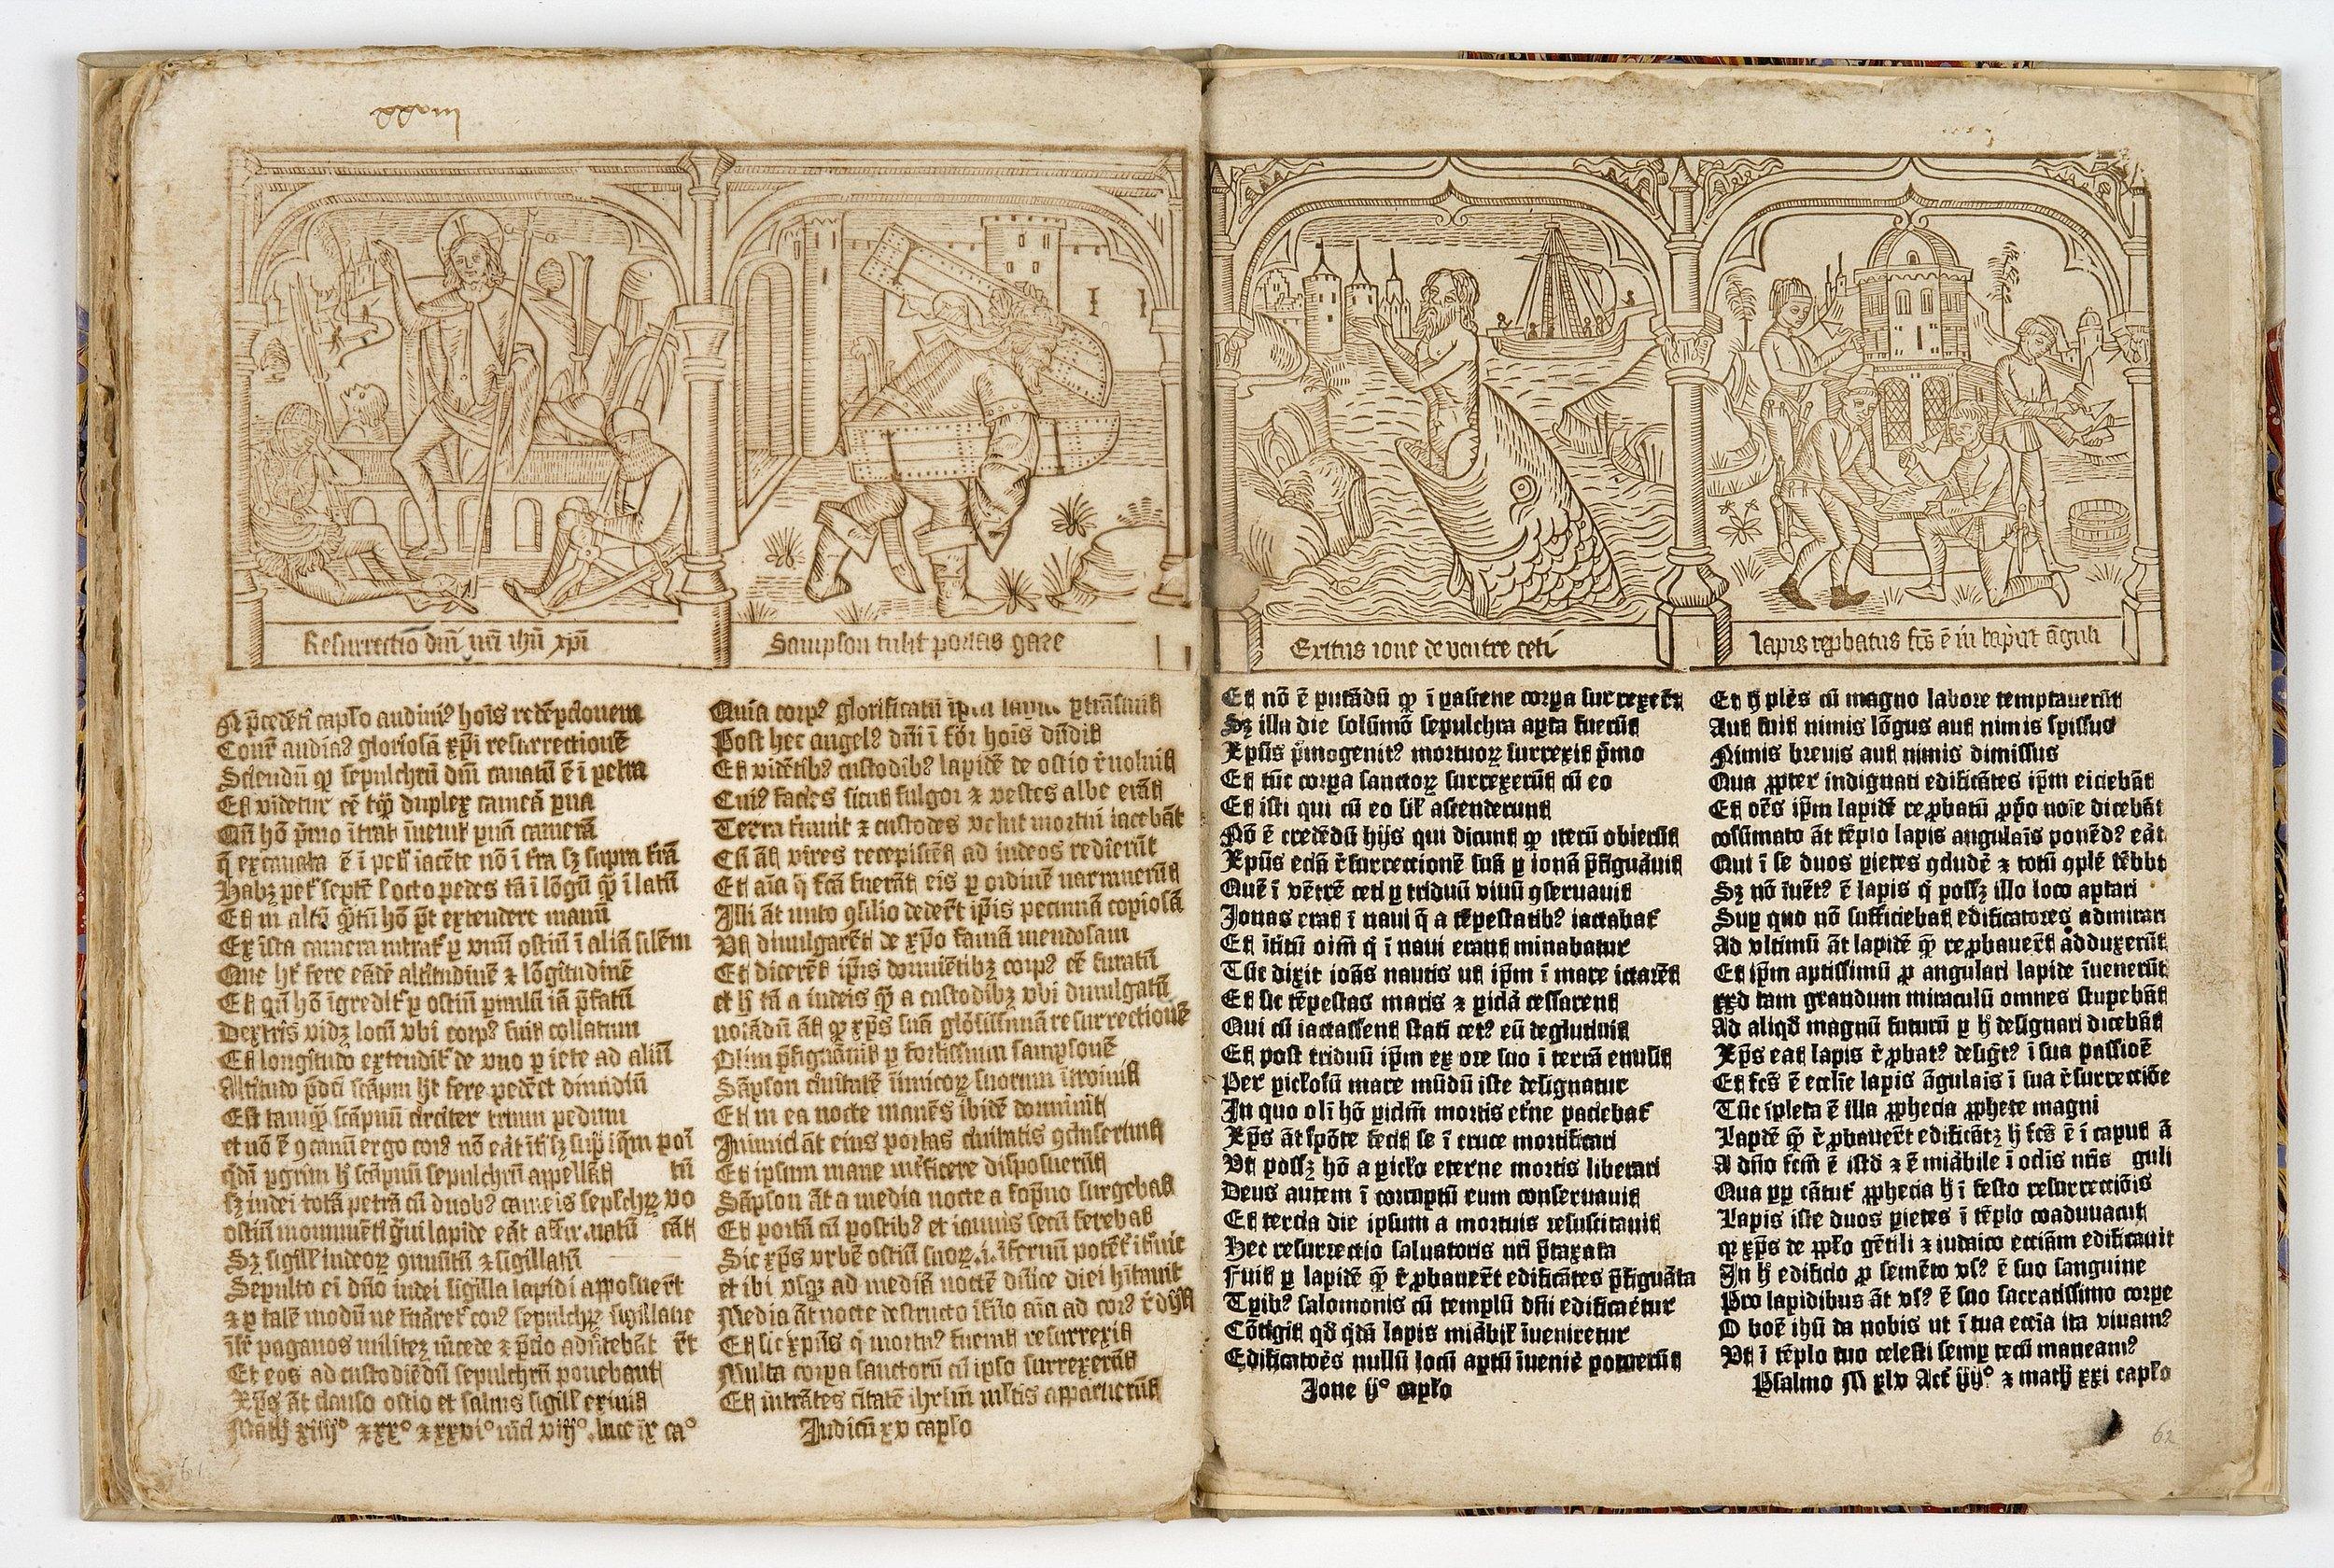 'Speculum humanae salvationis'[35 A 4, 61v-62r]